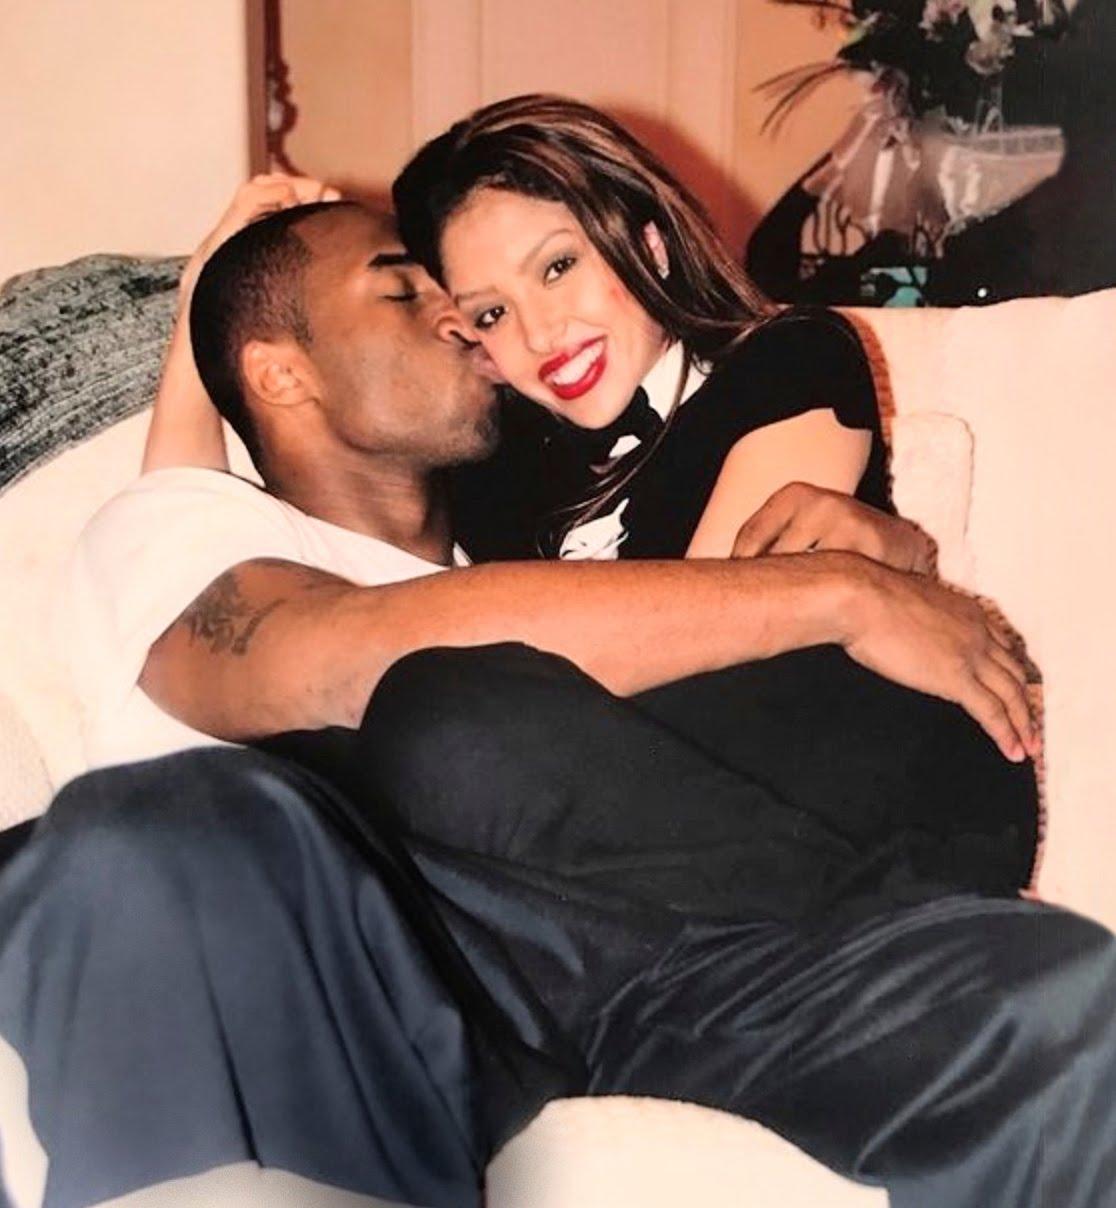 Vanessa Bryant Marks 20th Wedding Anniversary with Late Husband Kobe Bryant: 'I Love You'